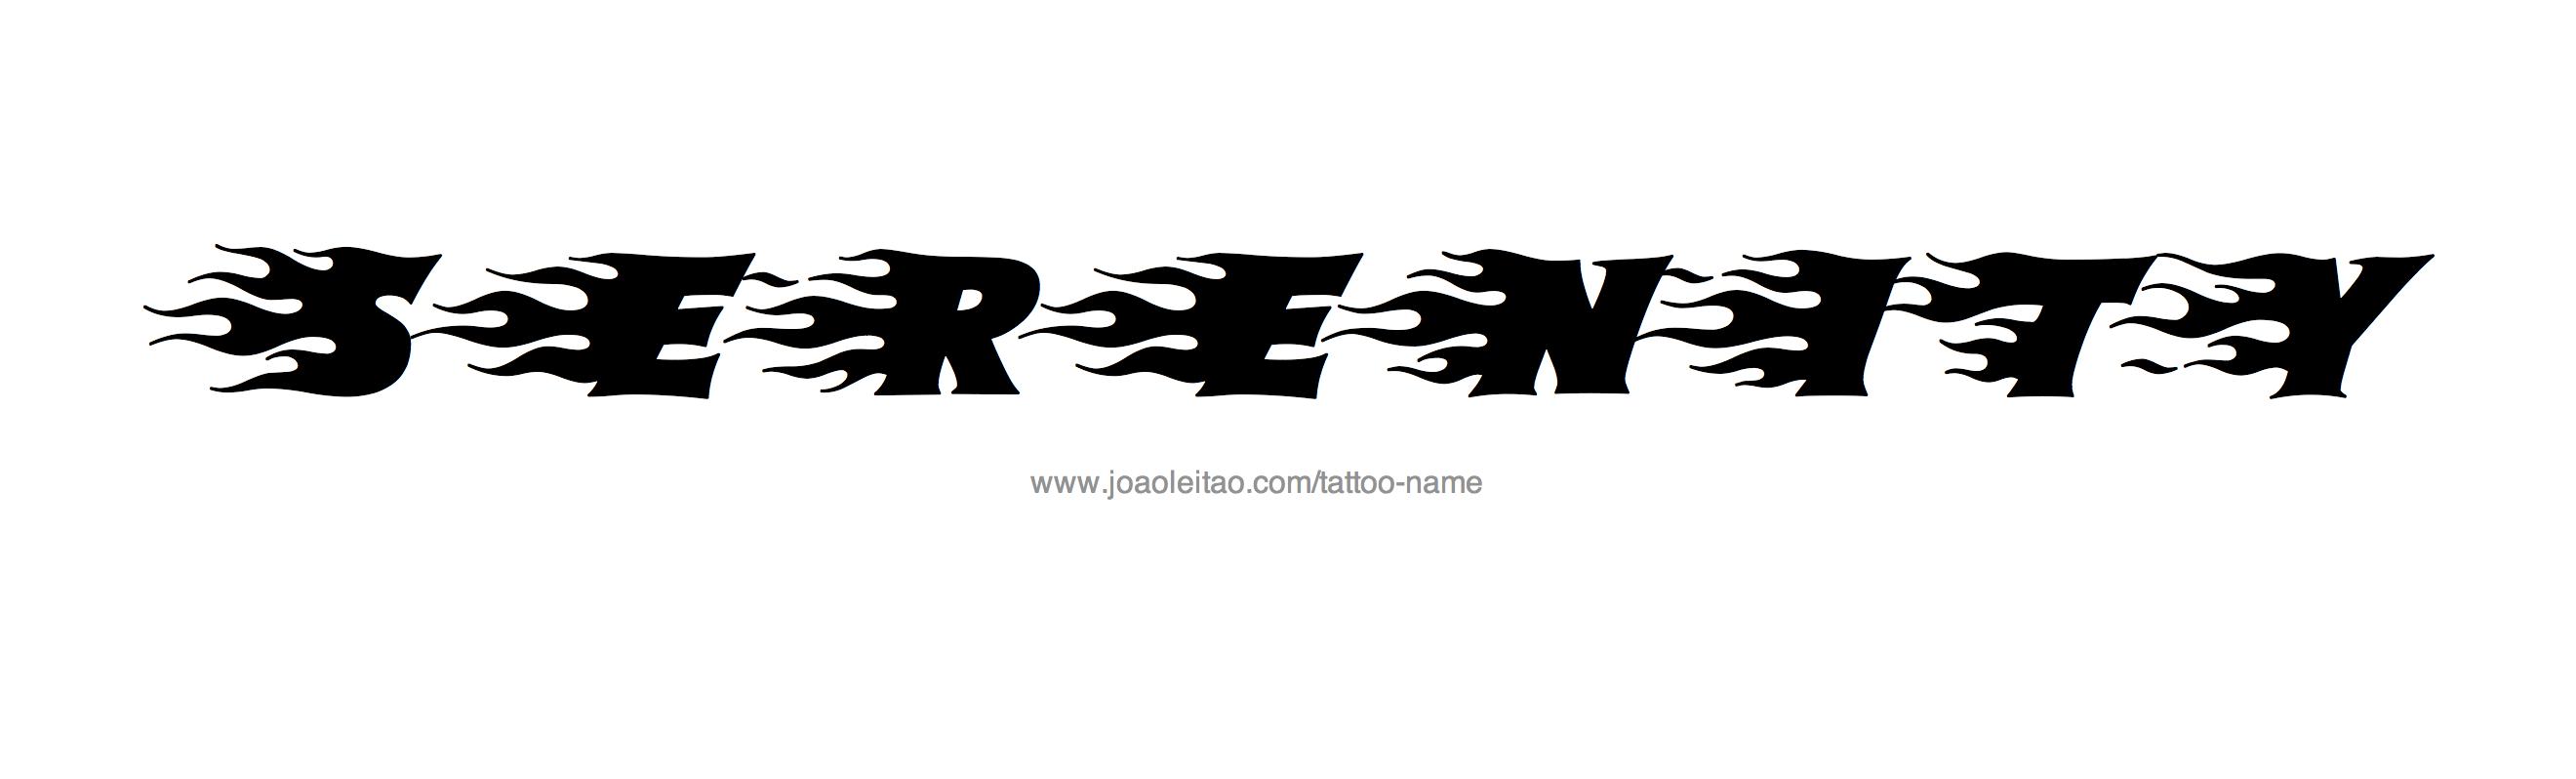 Serenity Name Tattoo Designs